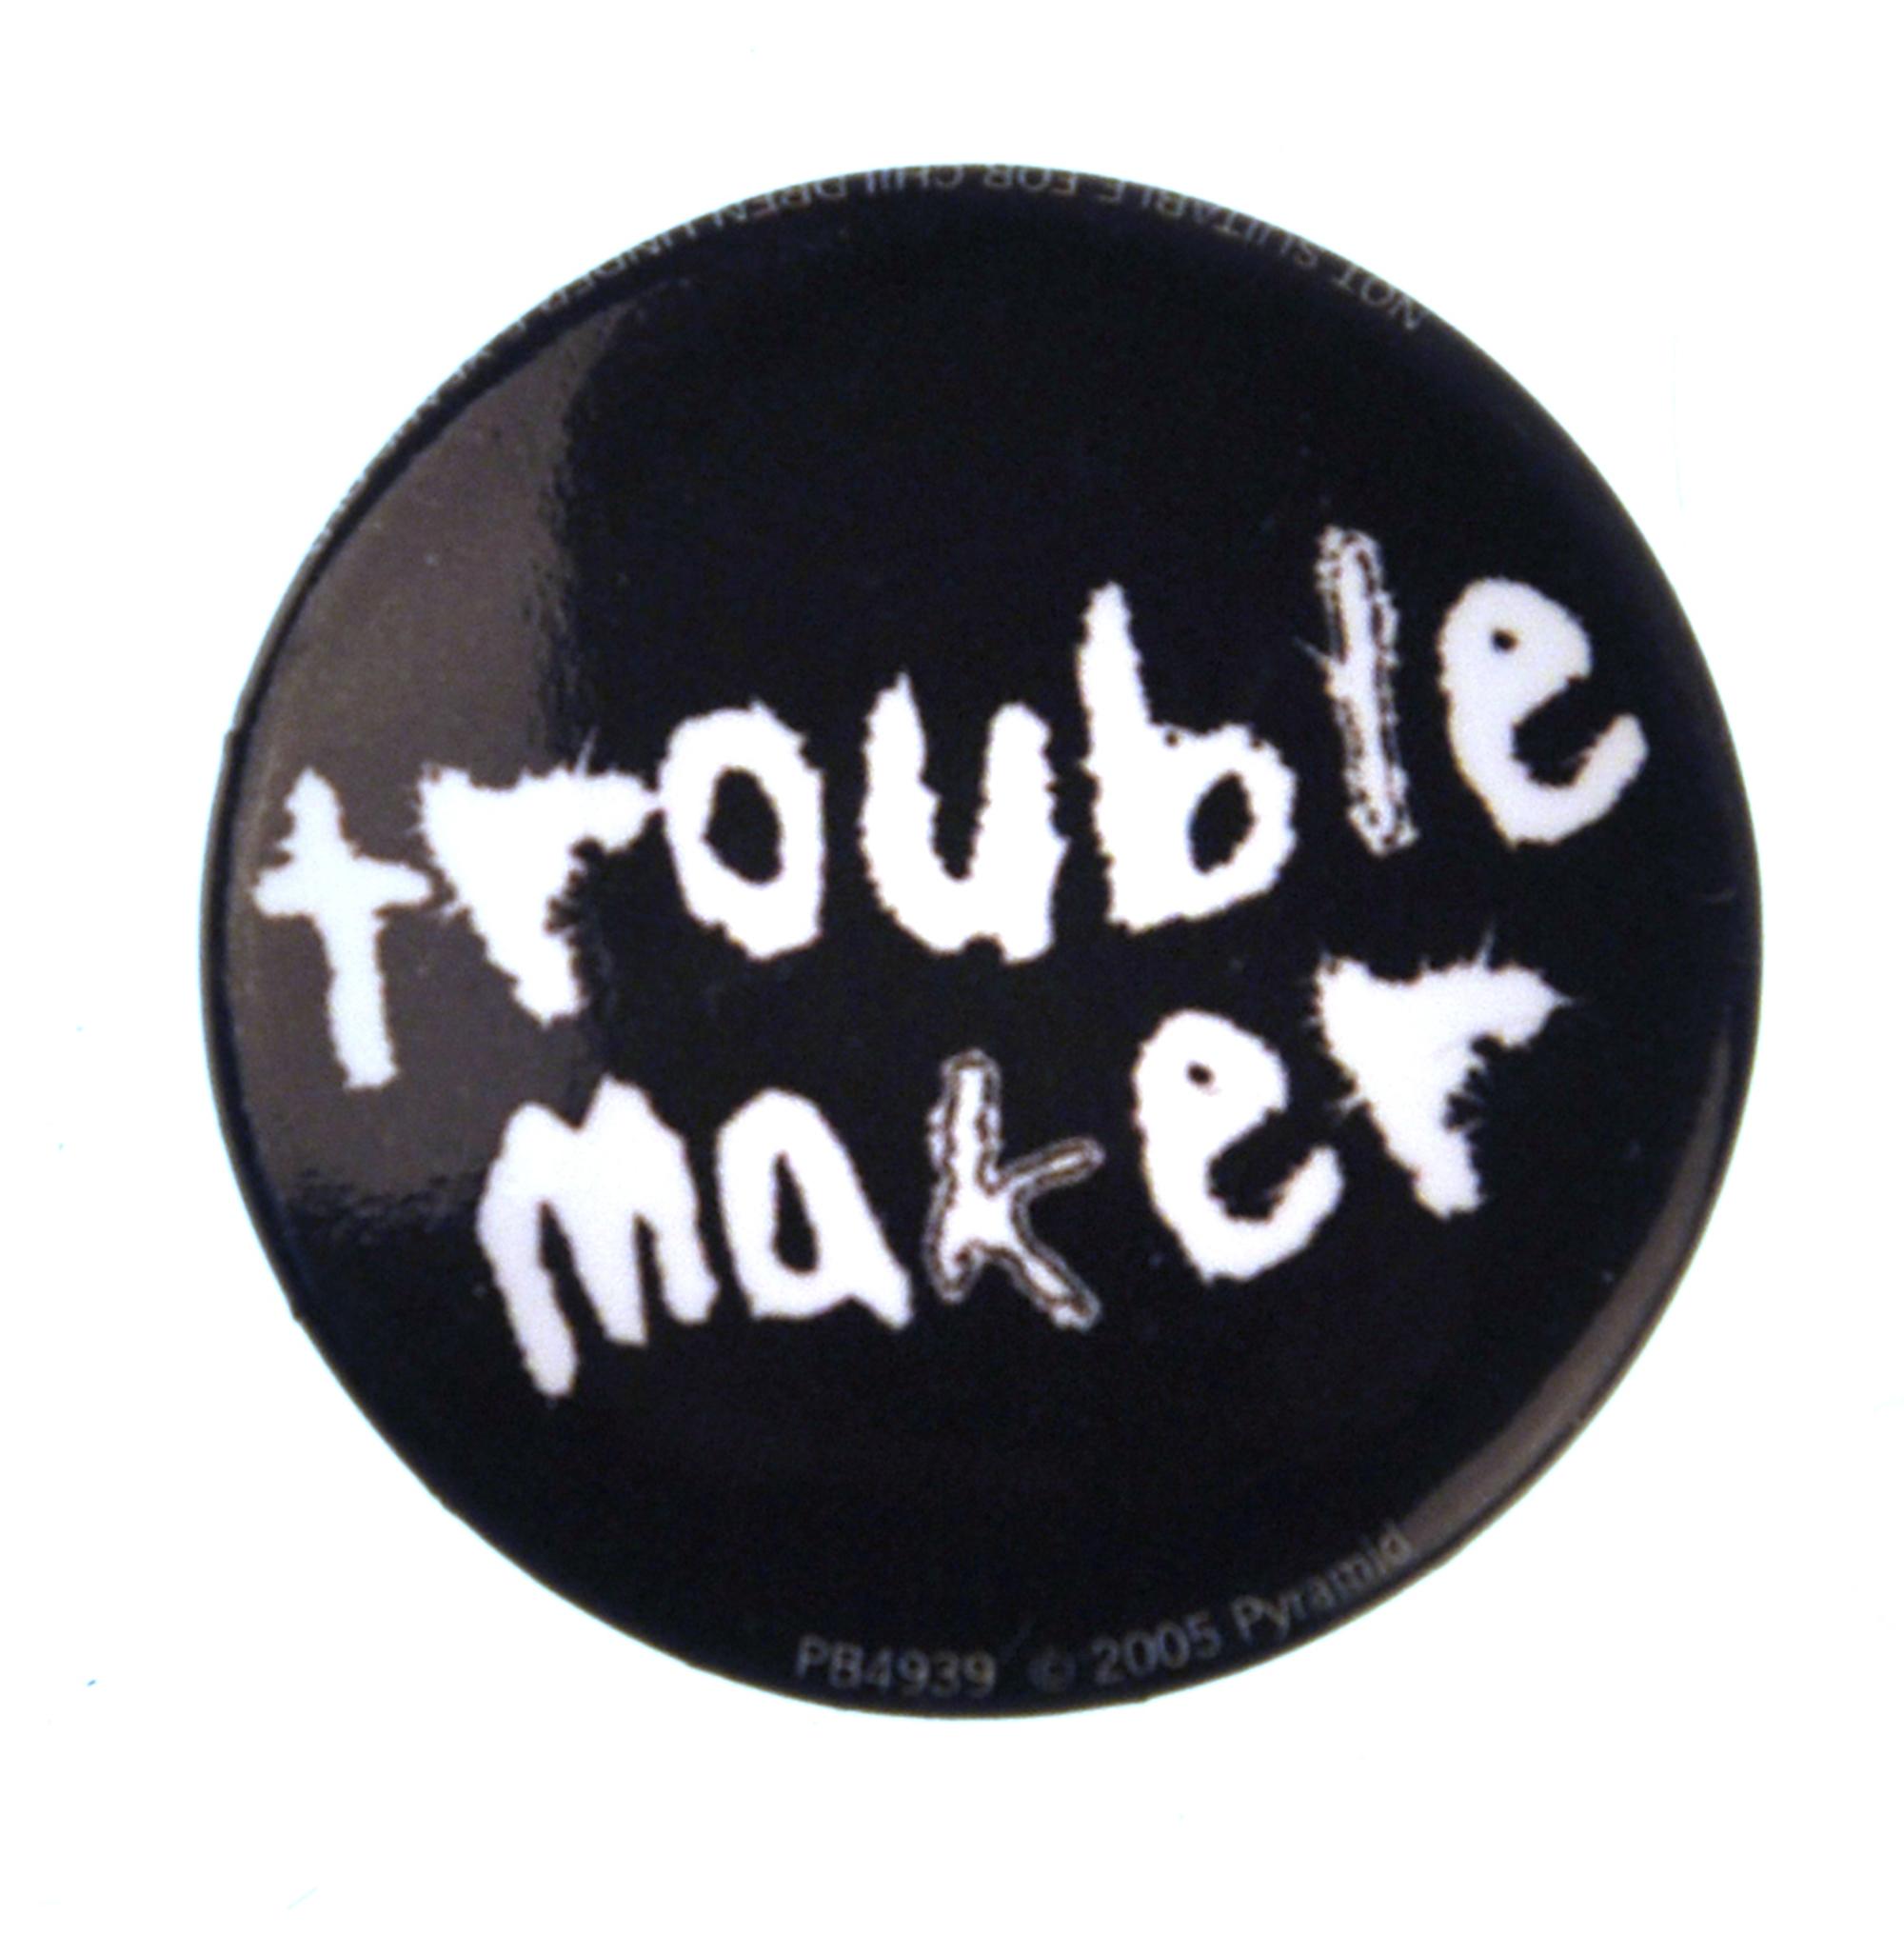 25mm Novelty Funny Joke Badge Trouble Maker Badge 1 inch